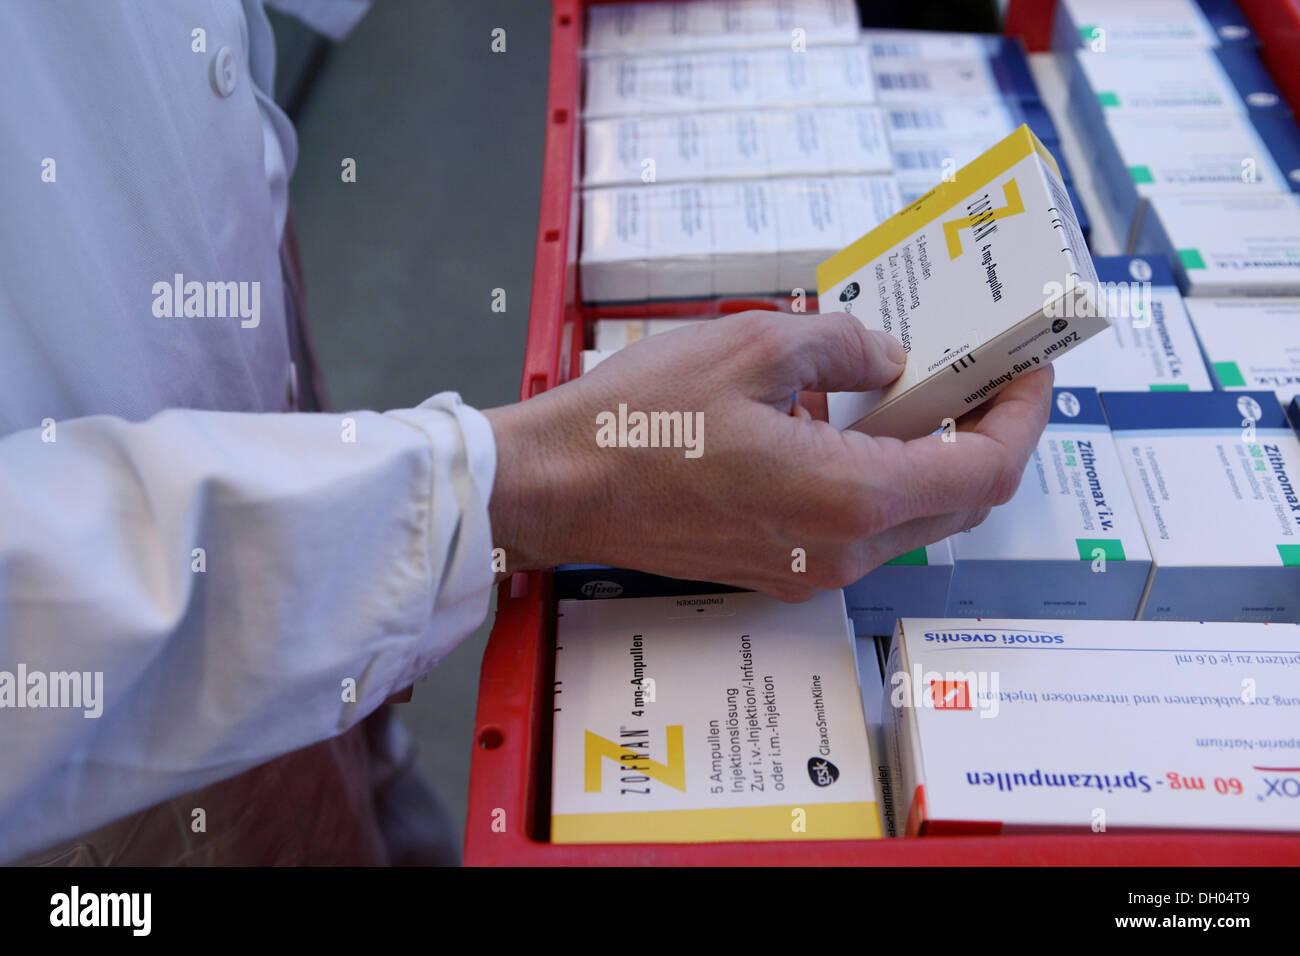 Chemist selecting medicine - Stock Image